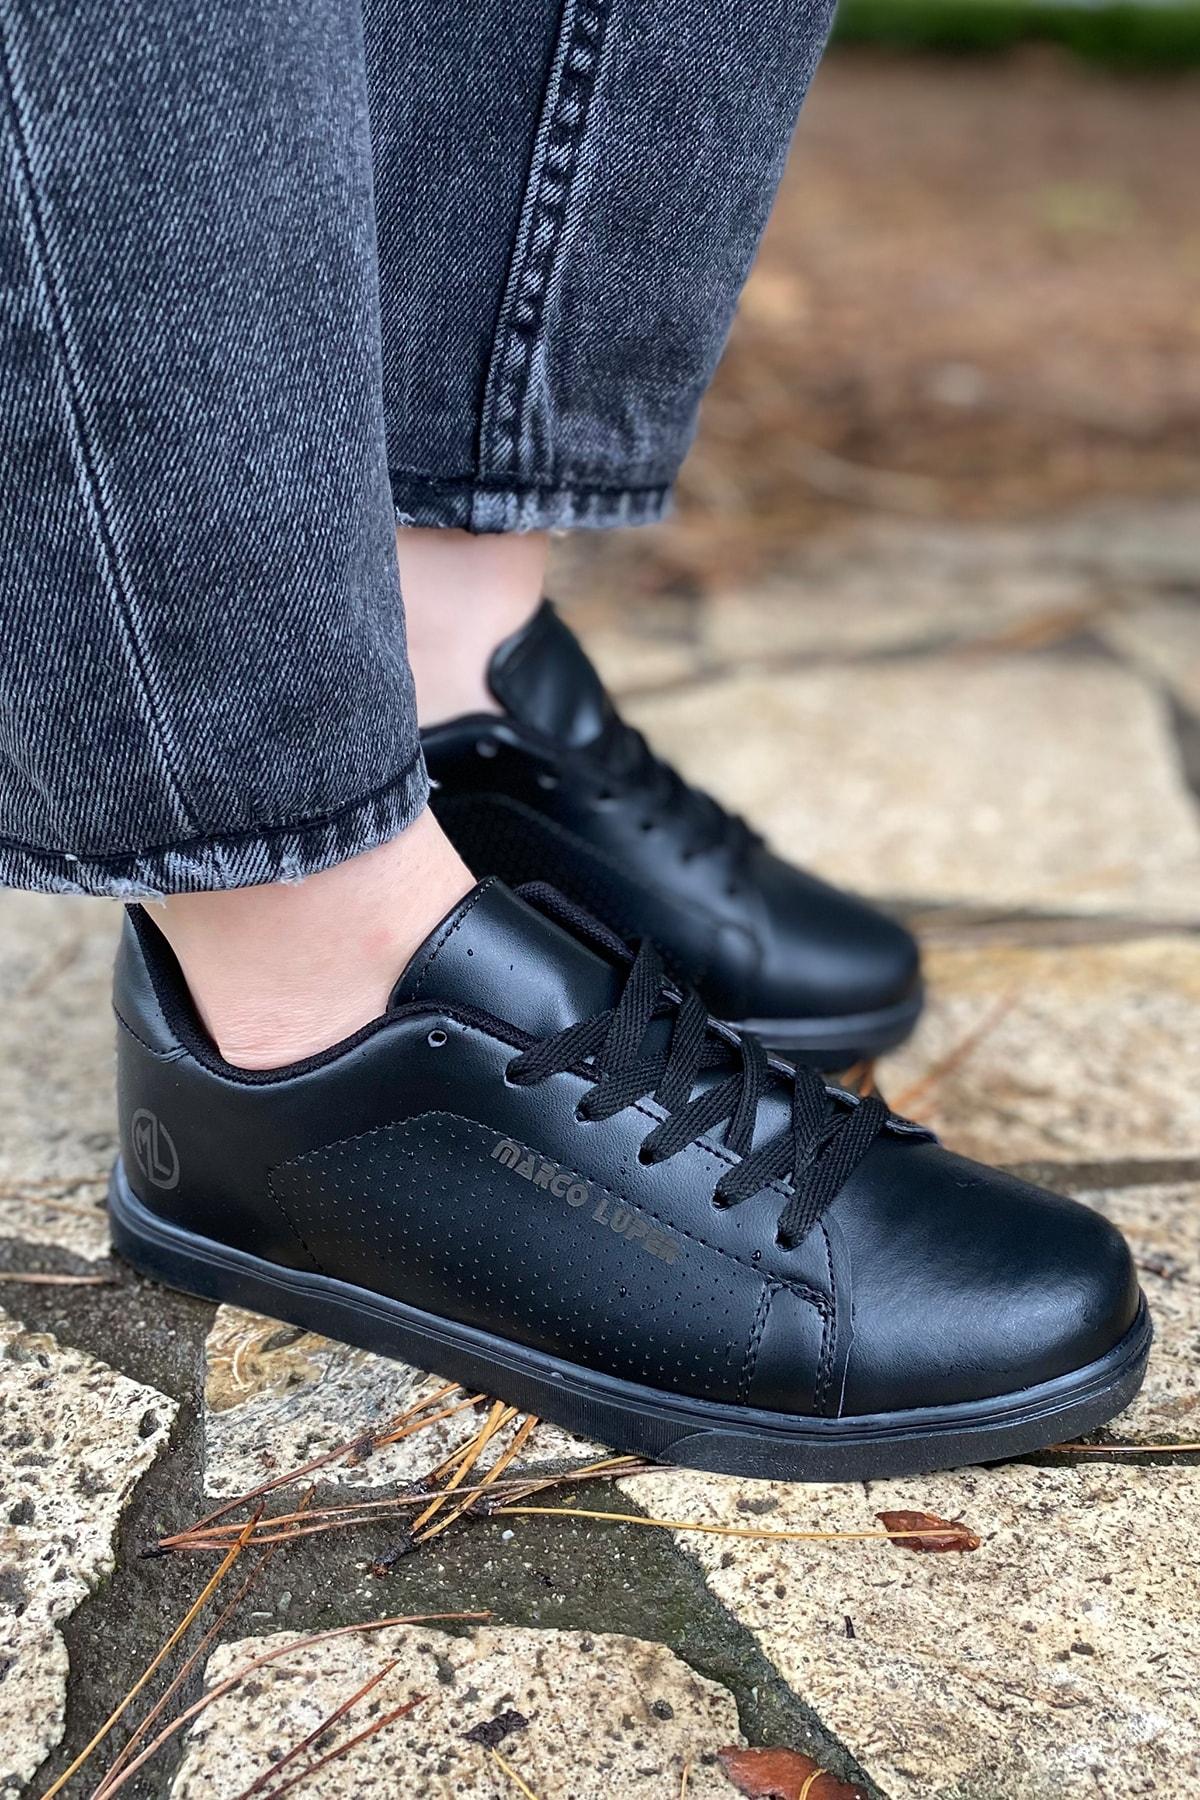 ICELAKE Kadın Siyah Sneaker Ysn01257kd00 1